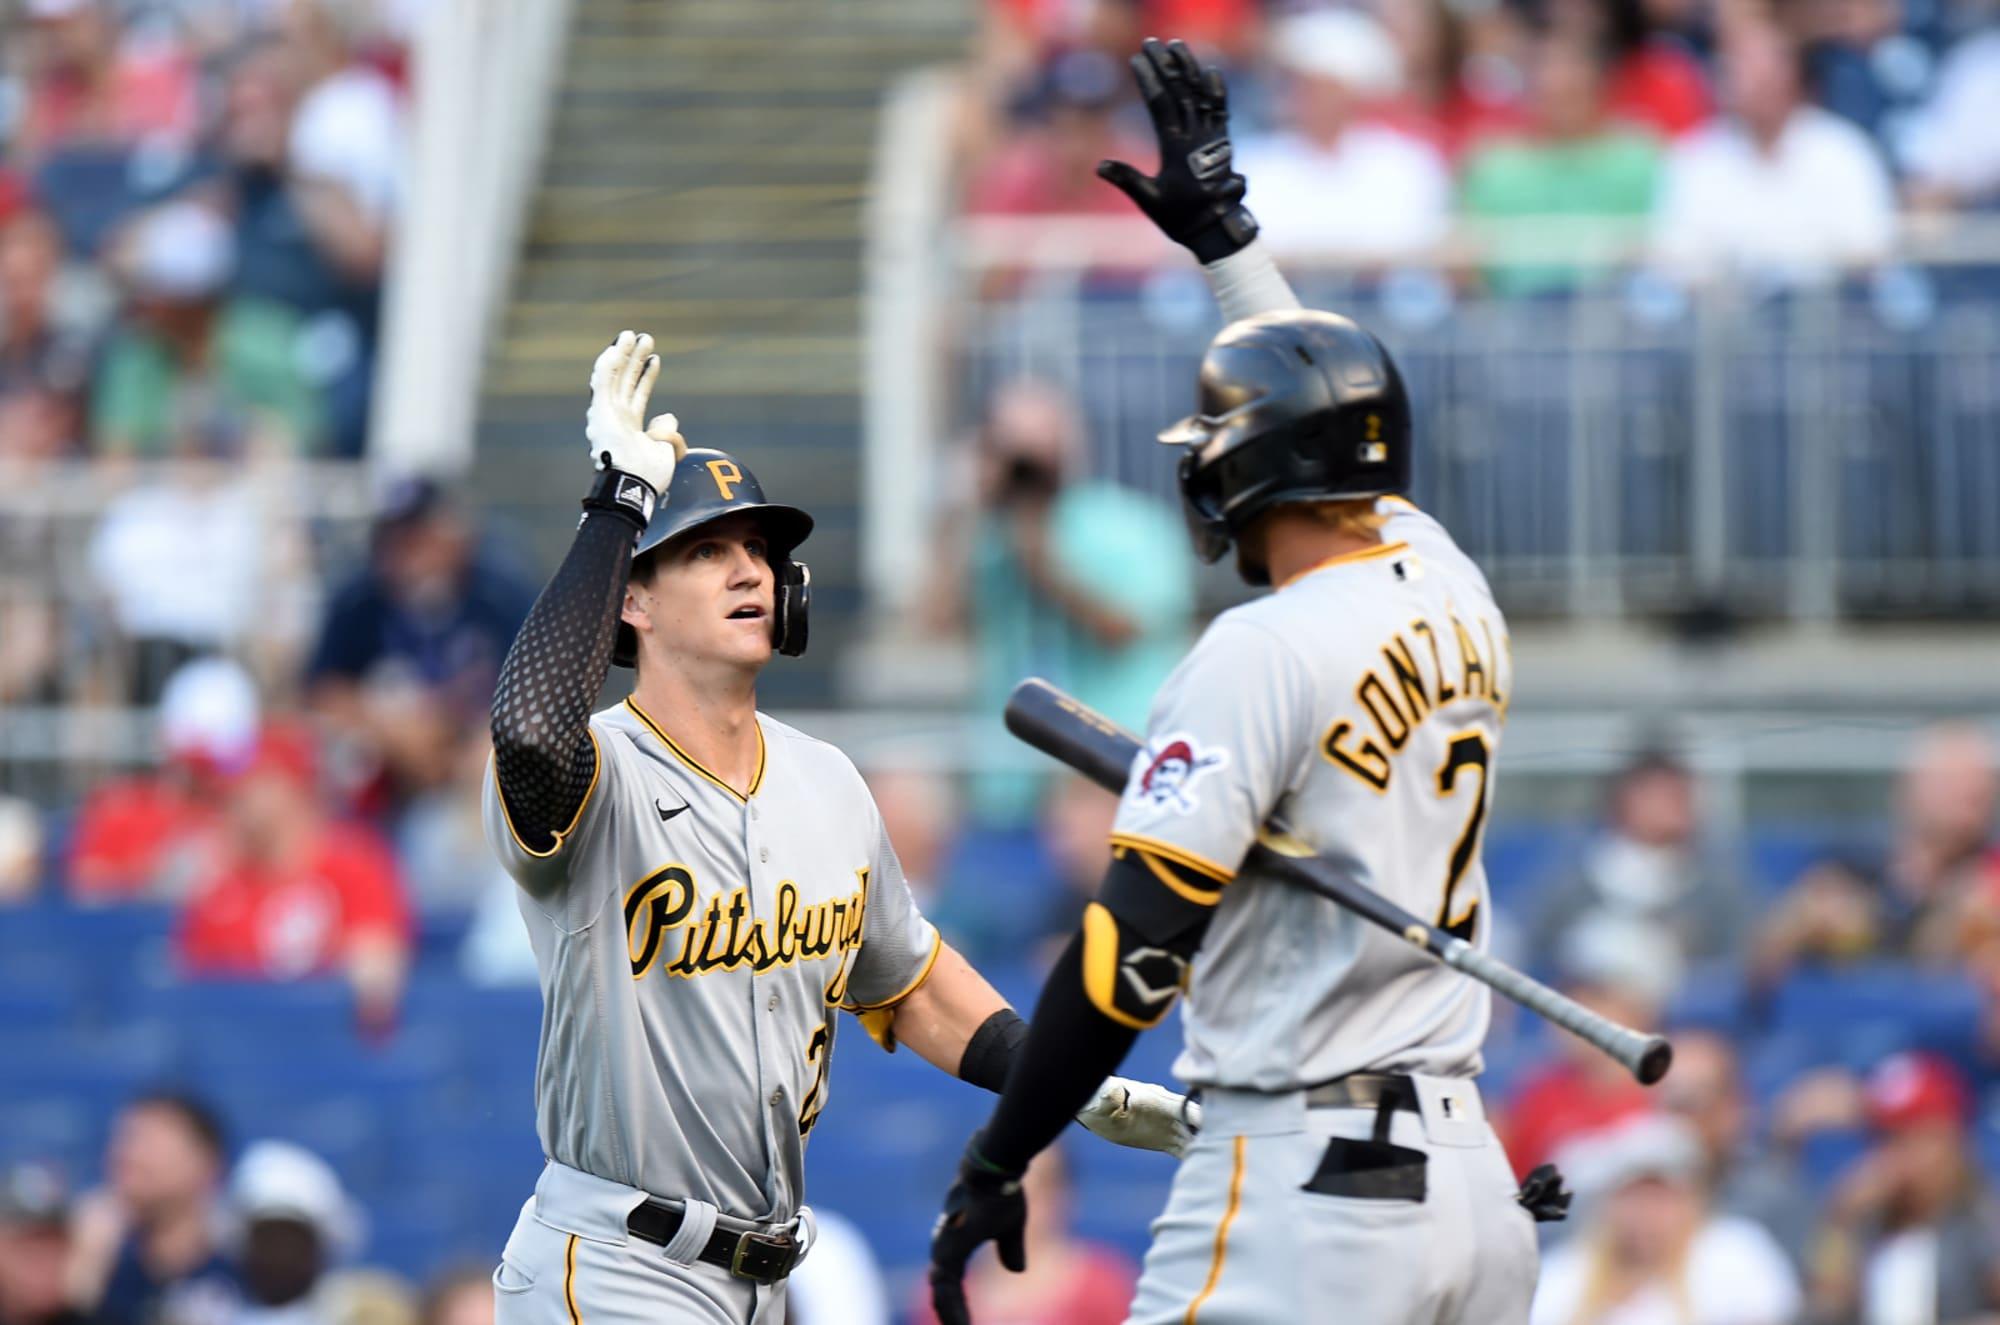 Pittsburgh Pirates Fall 3-2, Drop Series Opener in Washington